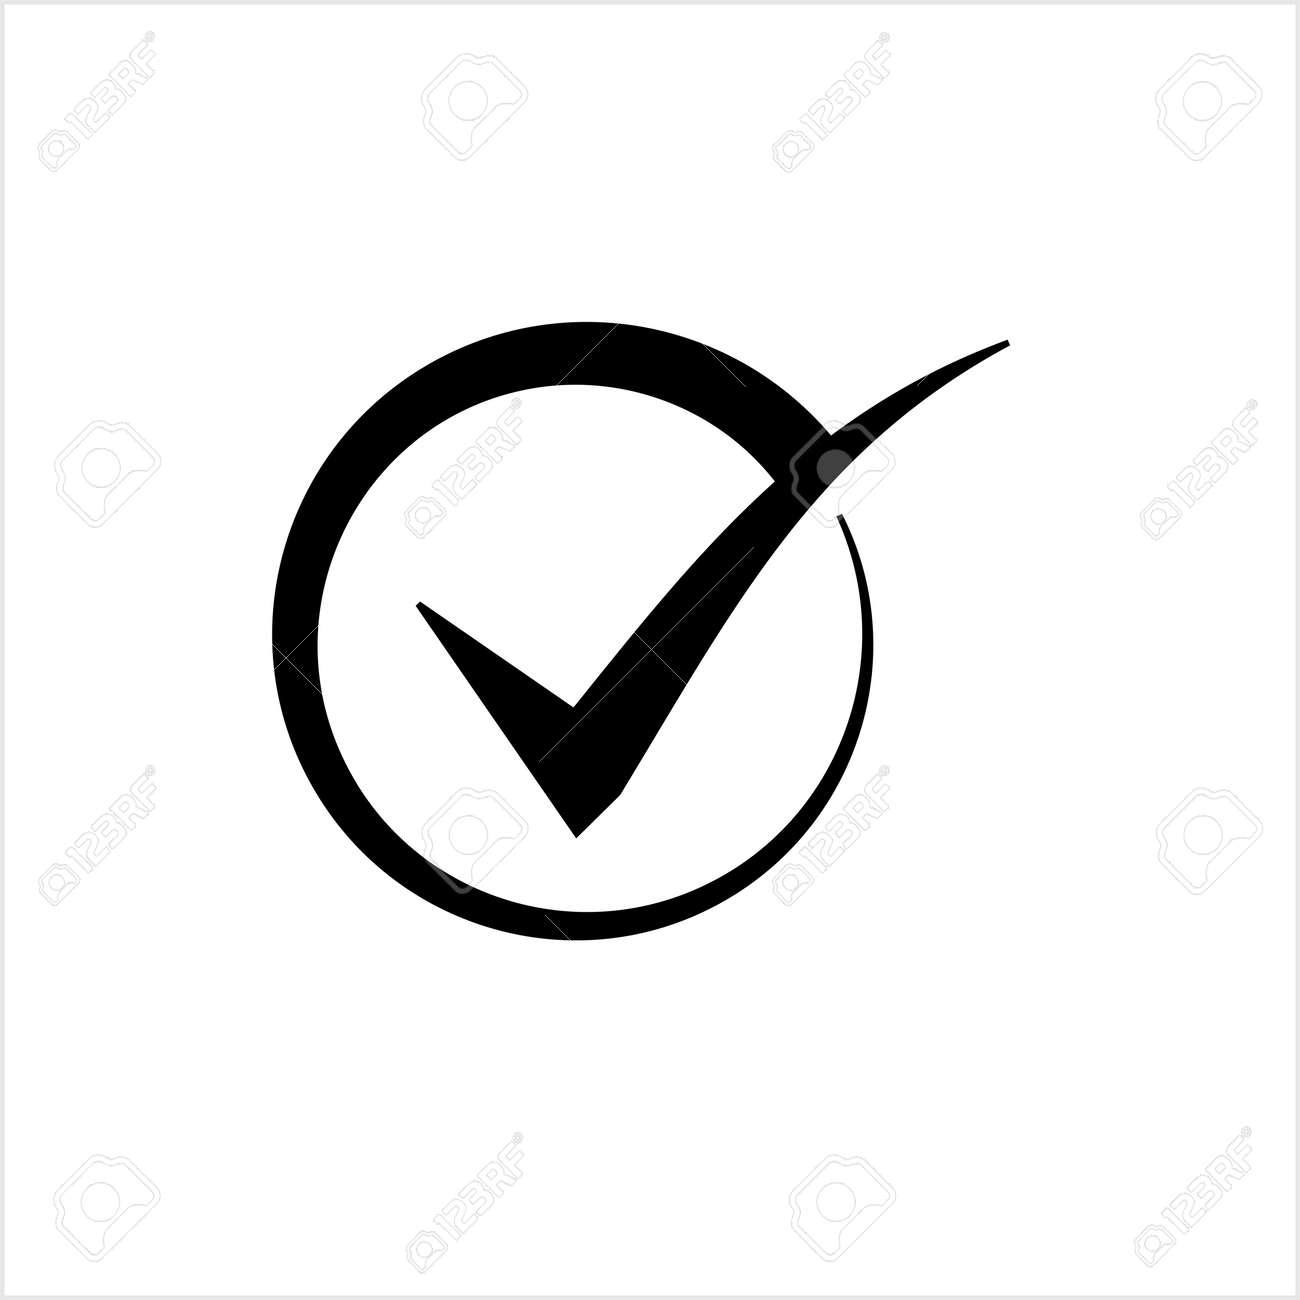 Tick Mark Icon, Check Mark, Right Mark, Vector Art Illustration - 148095418